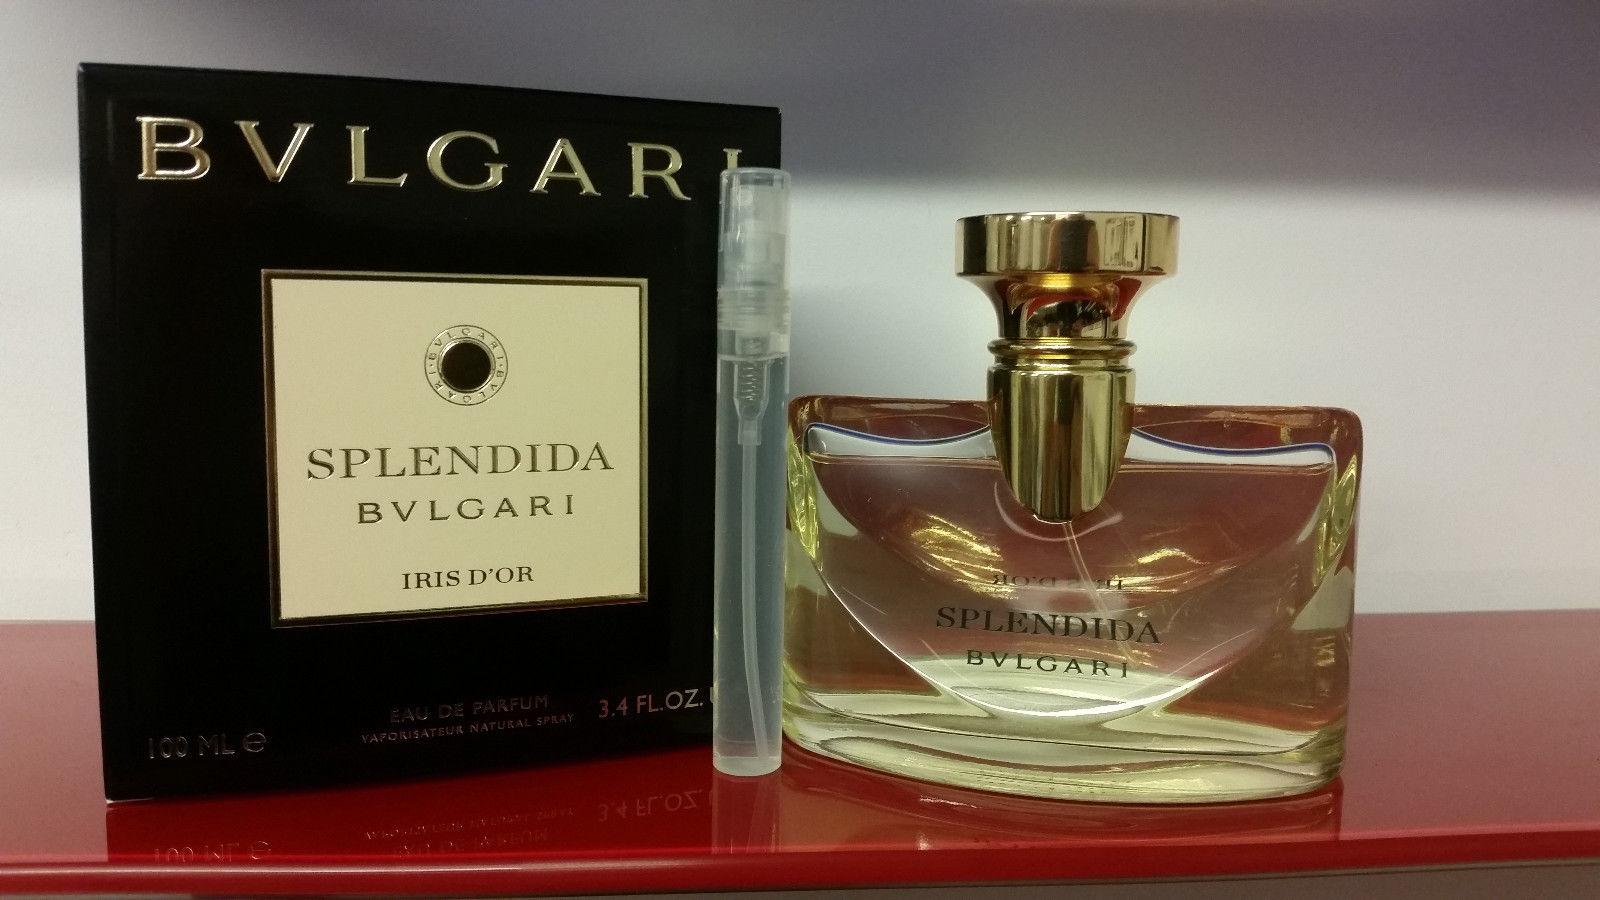 Splendida Iris d'Or Bvlgari for women kutu şişe plastik şişe dekant s-l1600.jpg